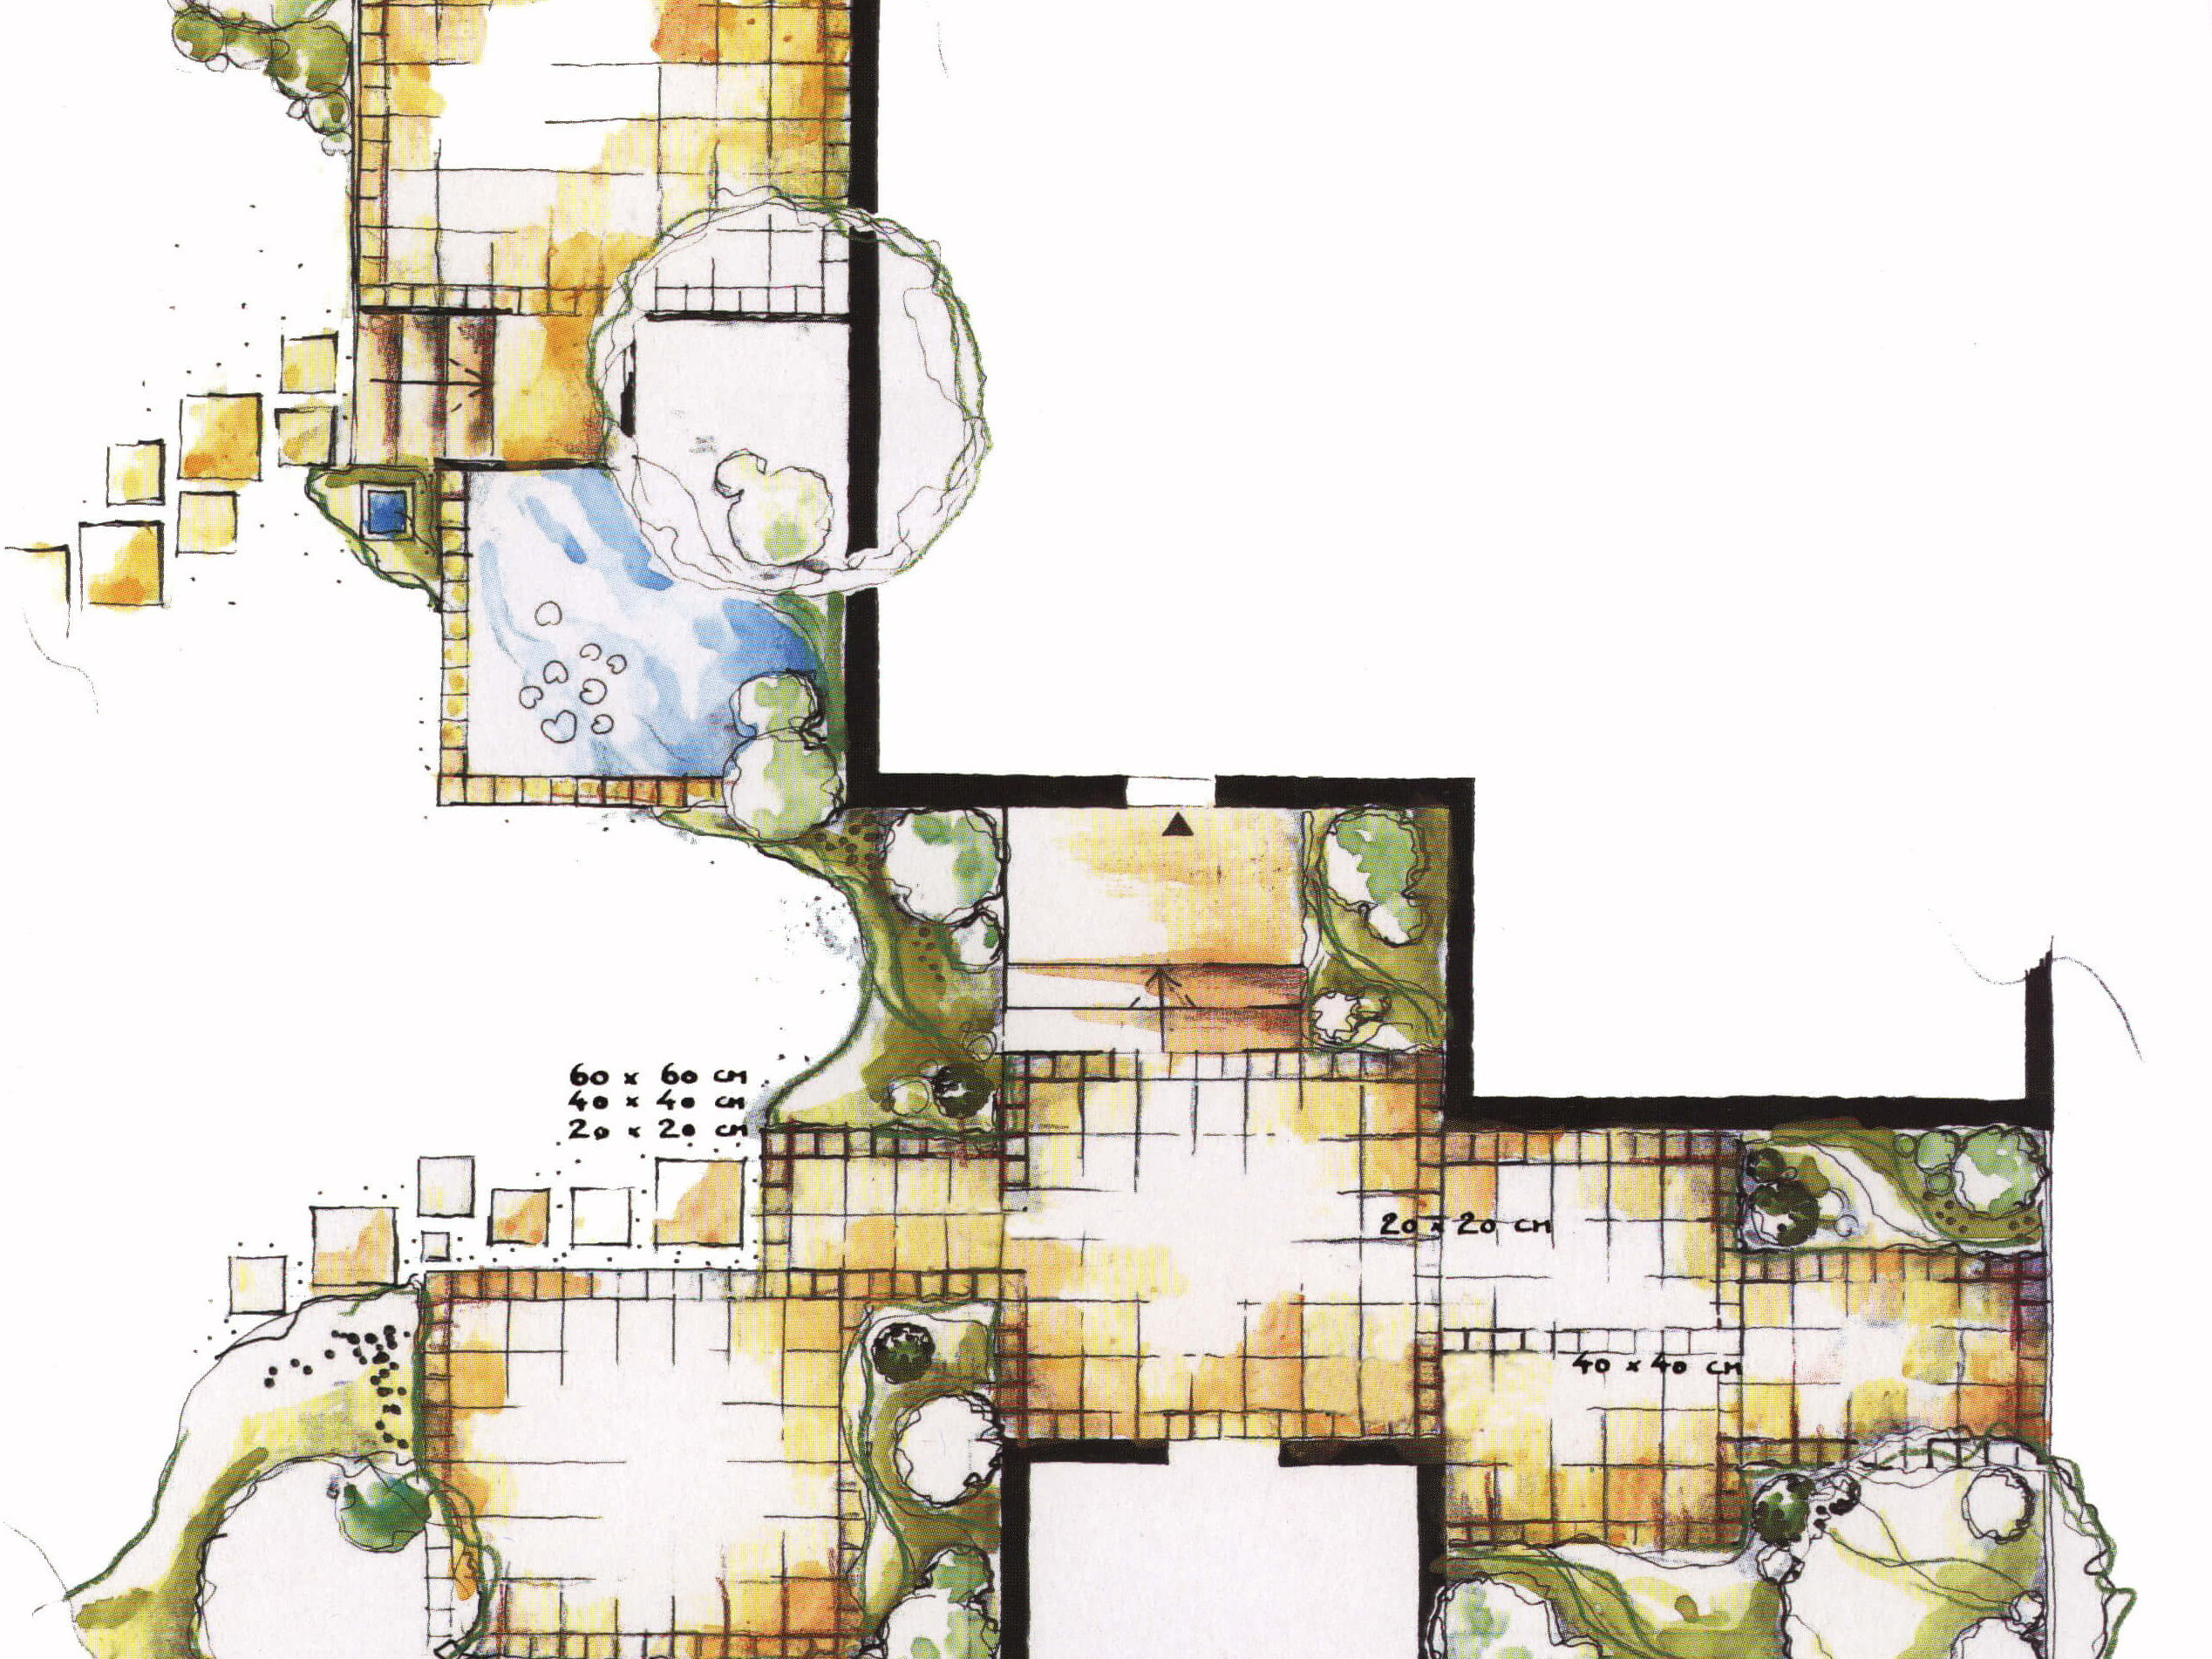 gartenplanung gartenbau gartenplanung landschaftsbau. Black Bedroom Furniture Sets. Home Design Ideas